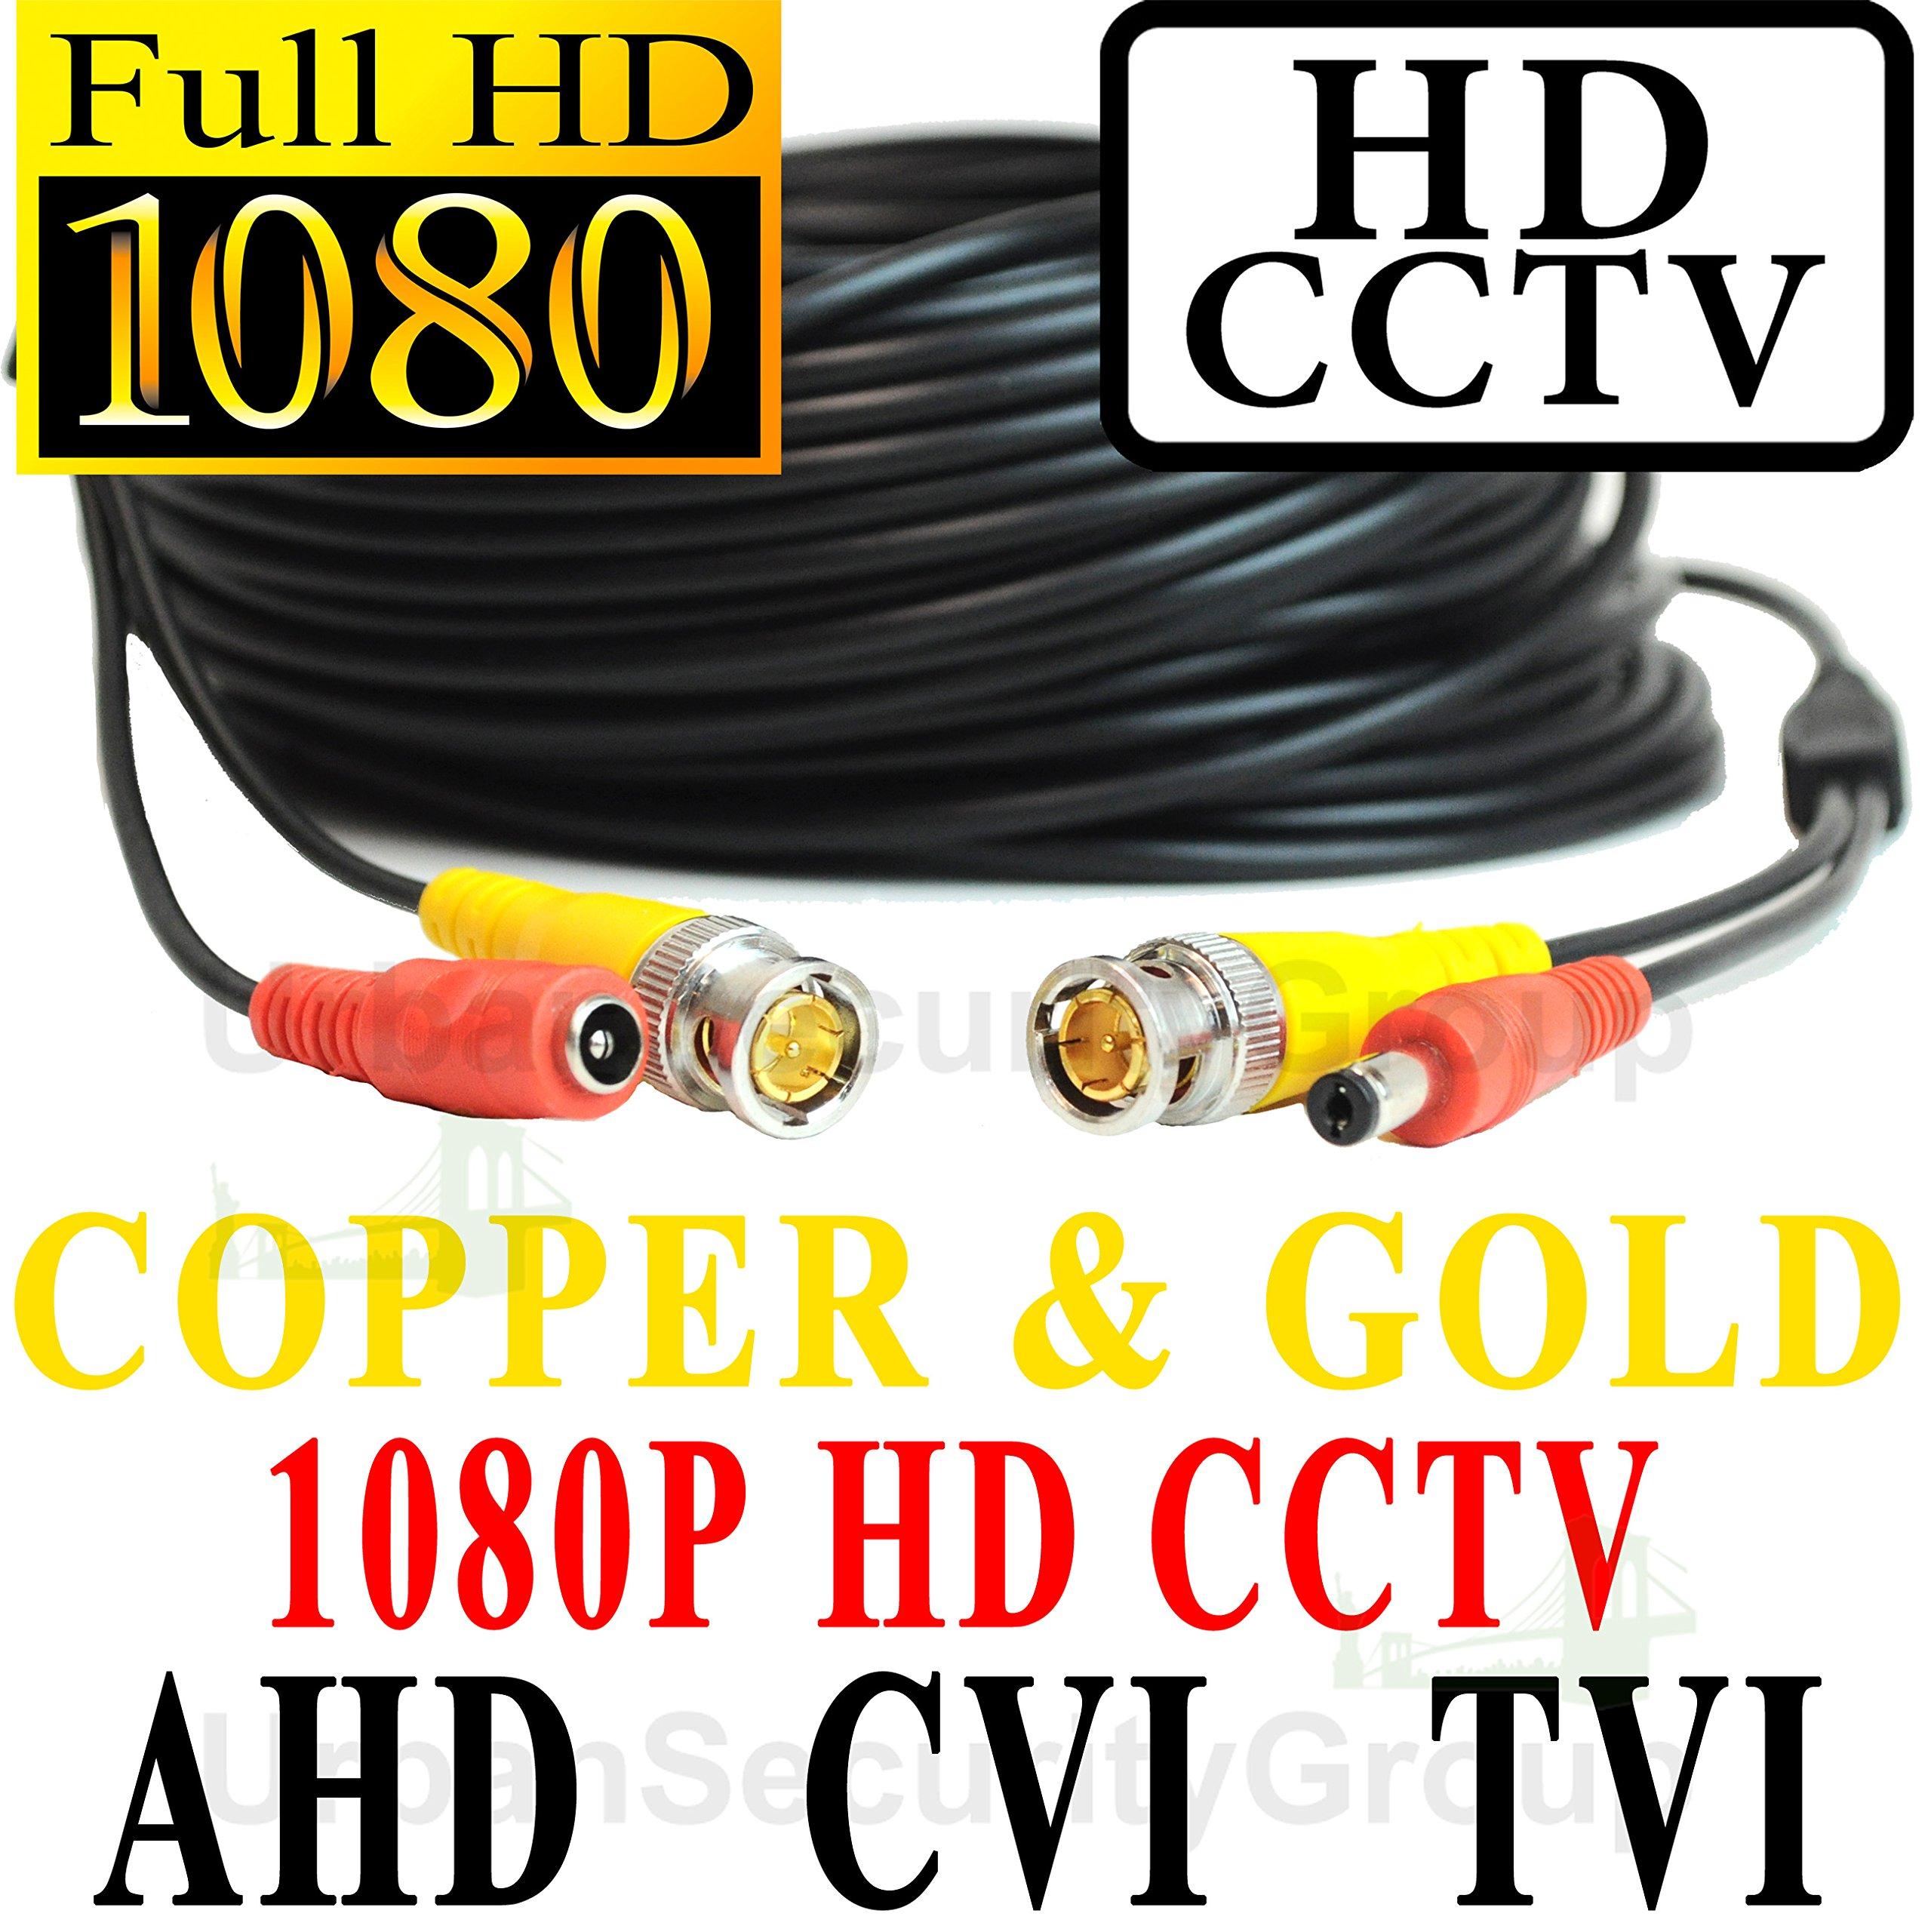 USG 50ft Premium Grade CCTV Cable for 1080P 2MP 3600TVL High Definition Analog, AHD, CVI + TVI Equipment Gold & Copper BNC Connectors Siamese 24AWG Power & 26AWG Video NOT FOR SDI